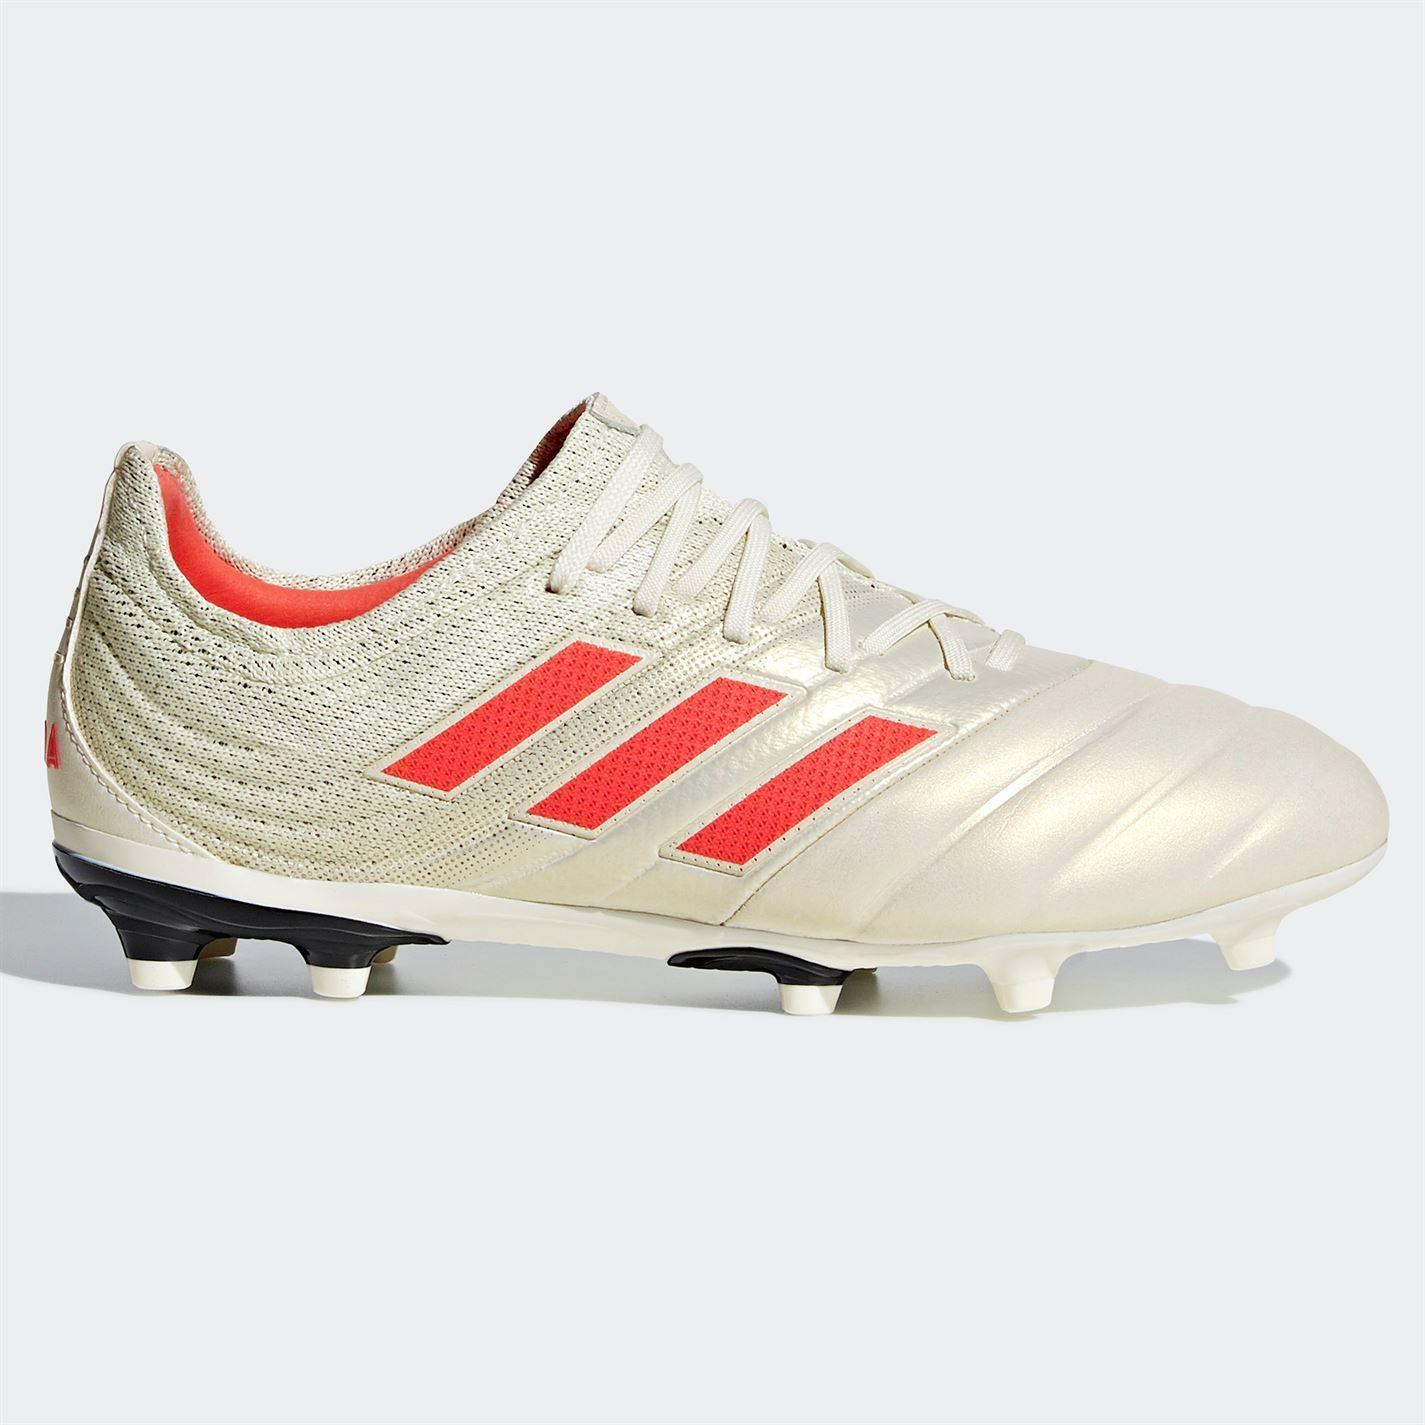 adidas Copa 19.1 FG Firm Ground Football Boots Juniors White